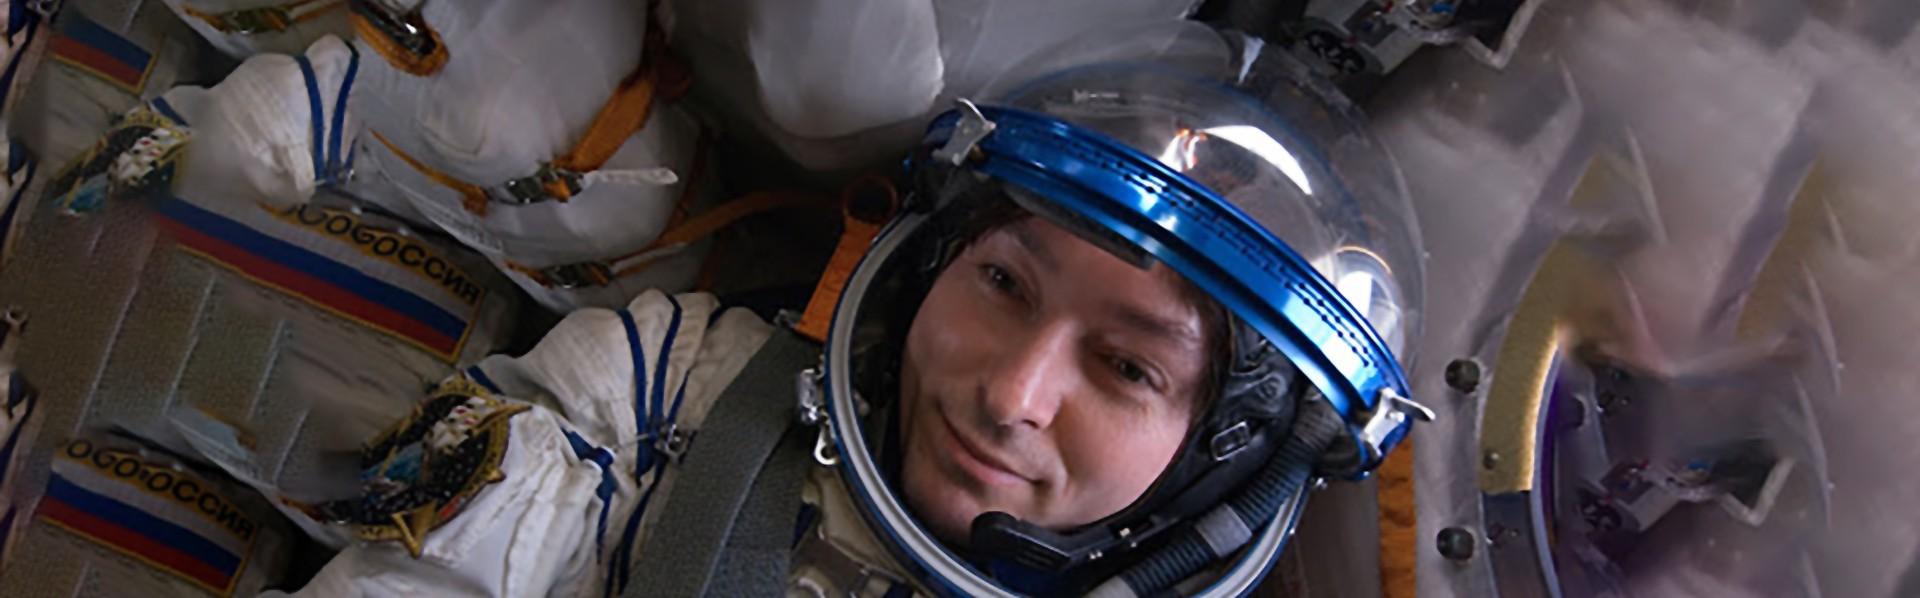 Cosmonauta ruso Sergei Levin